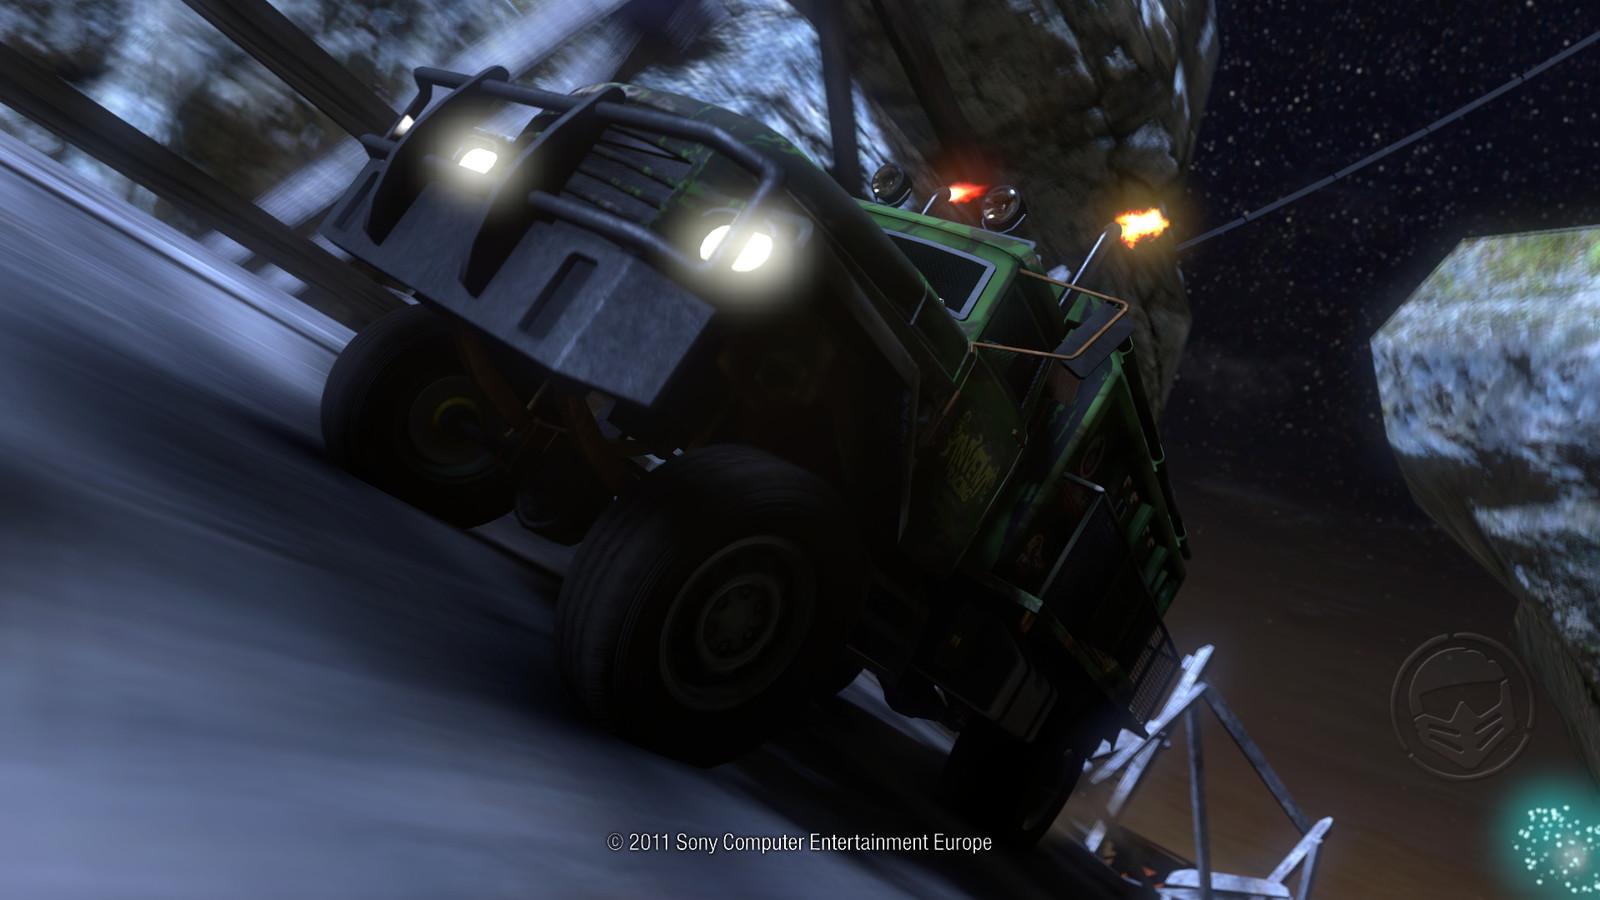 Molotov Shelka (In-game screenshot)